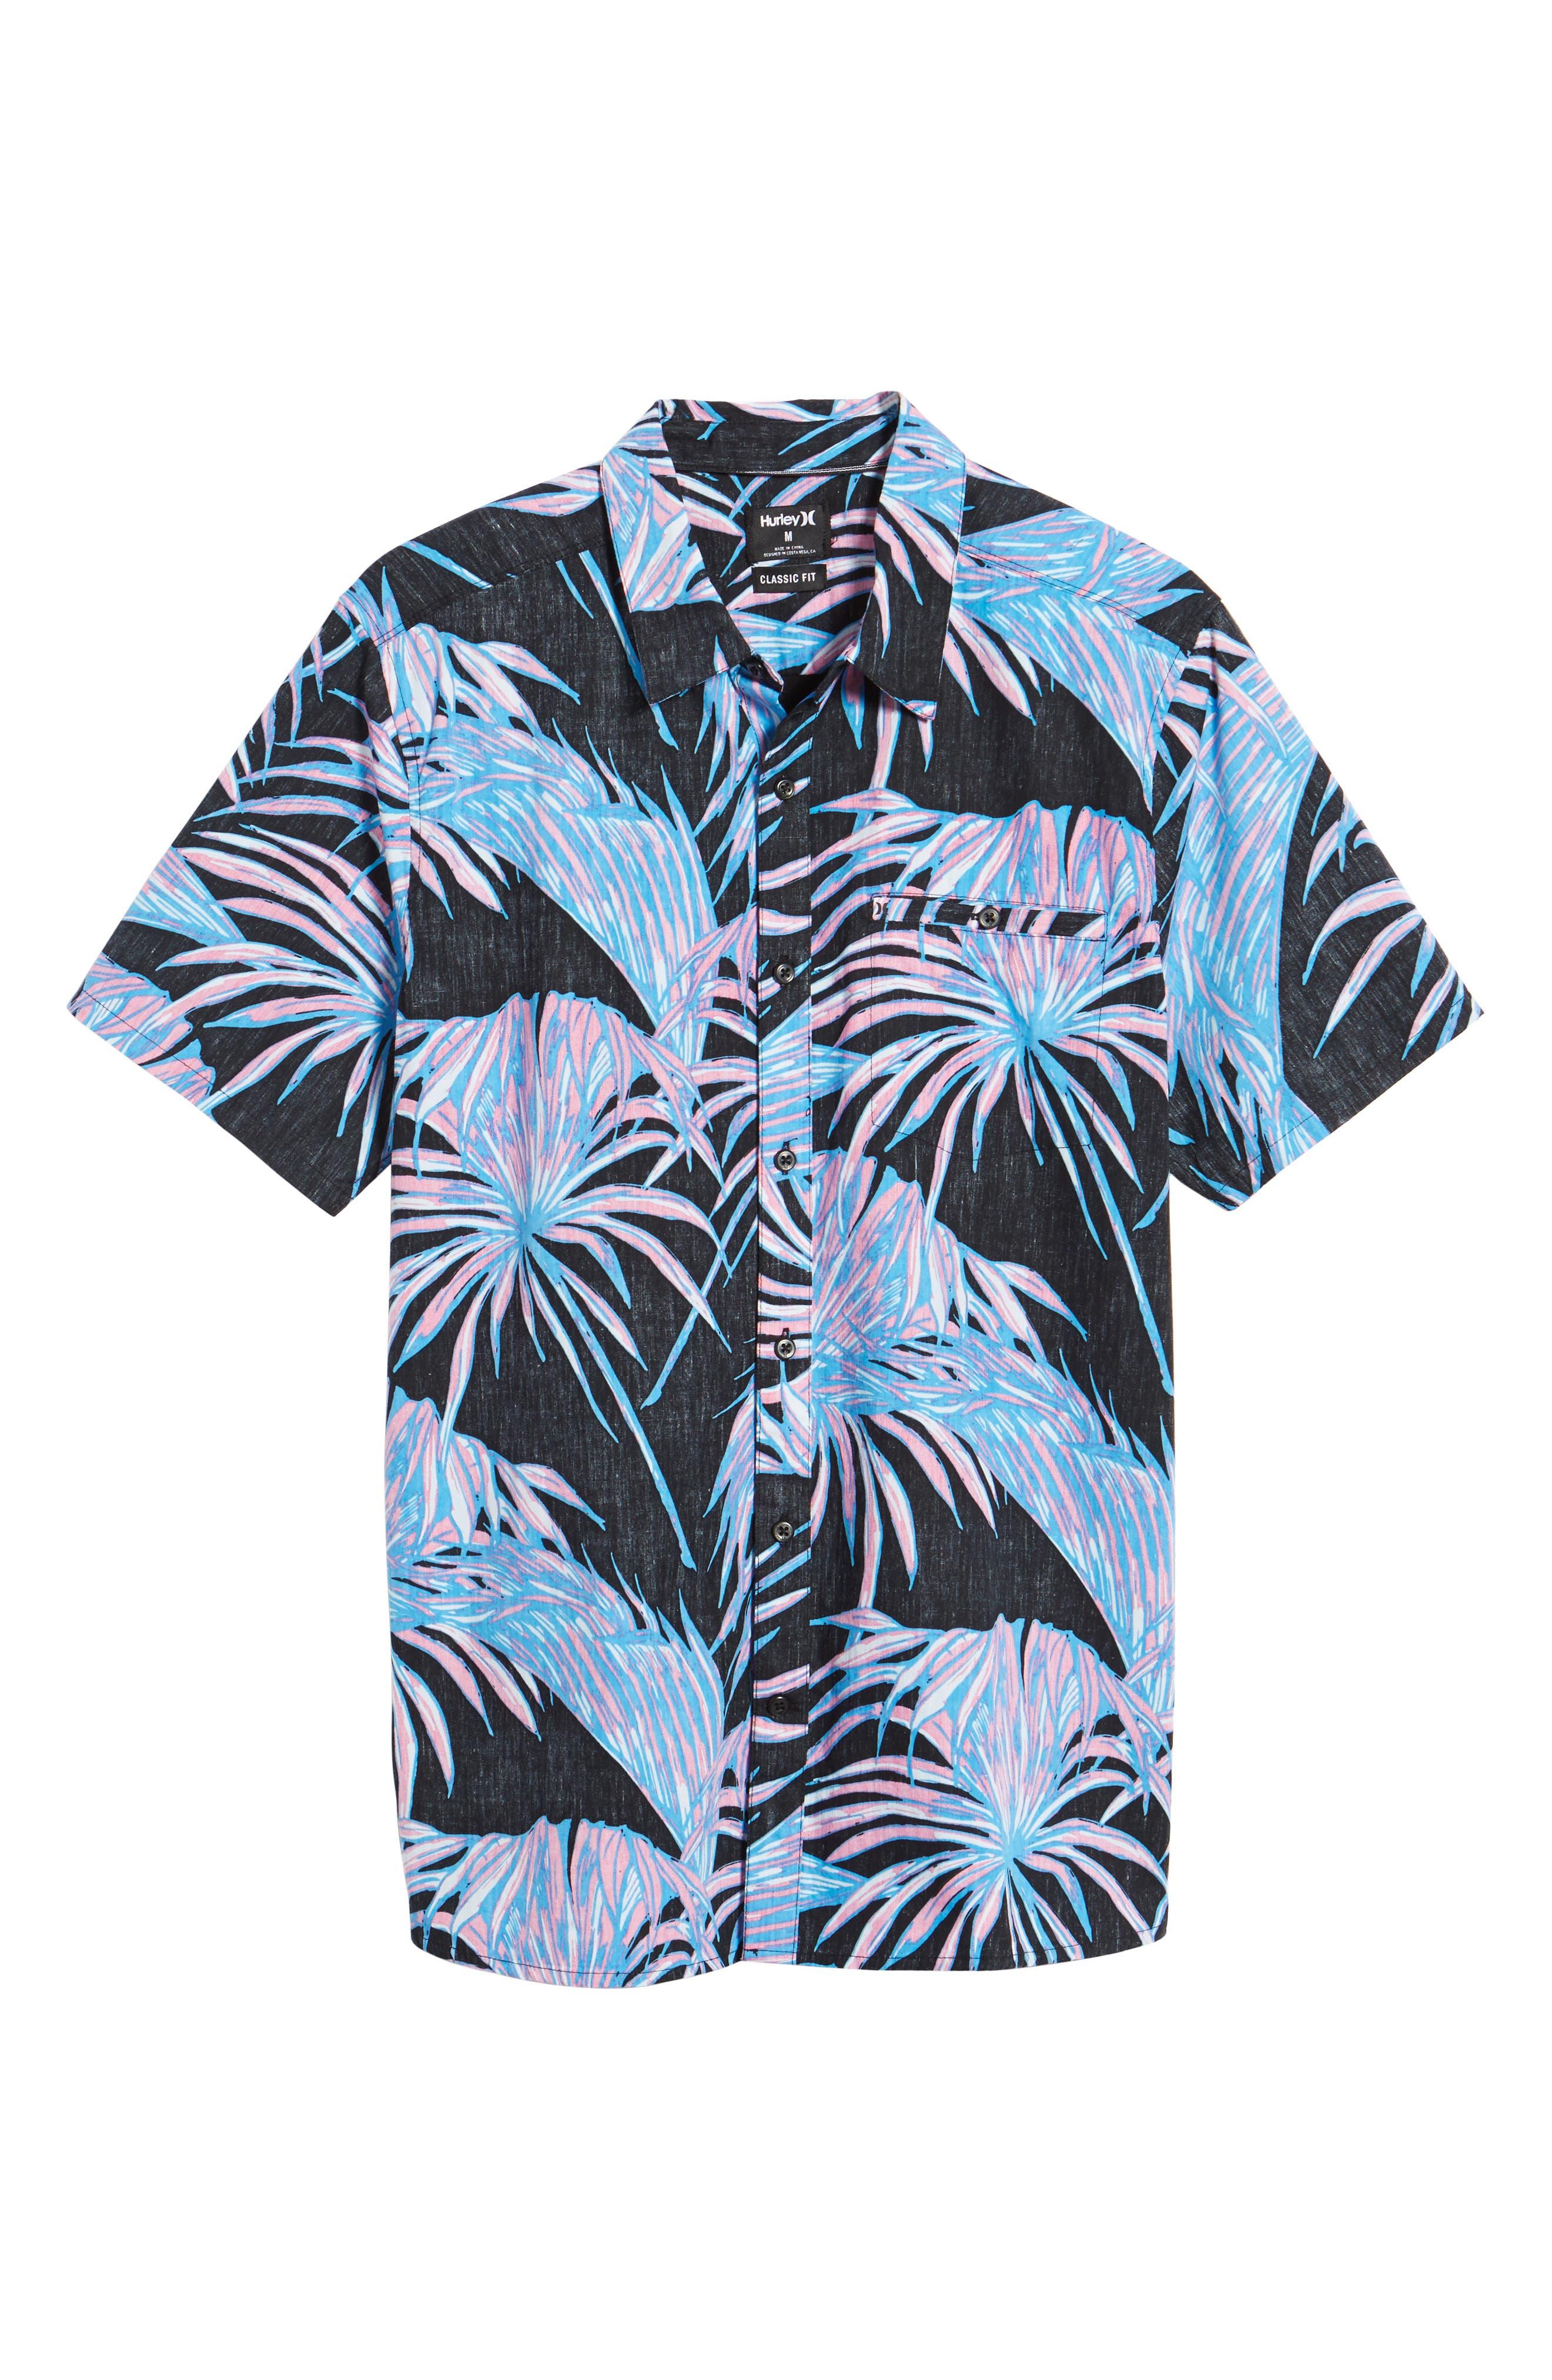 Koko Shirt,                             Alternate thumbnail 6, color,                             010